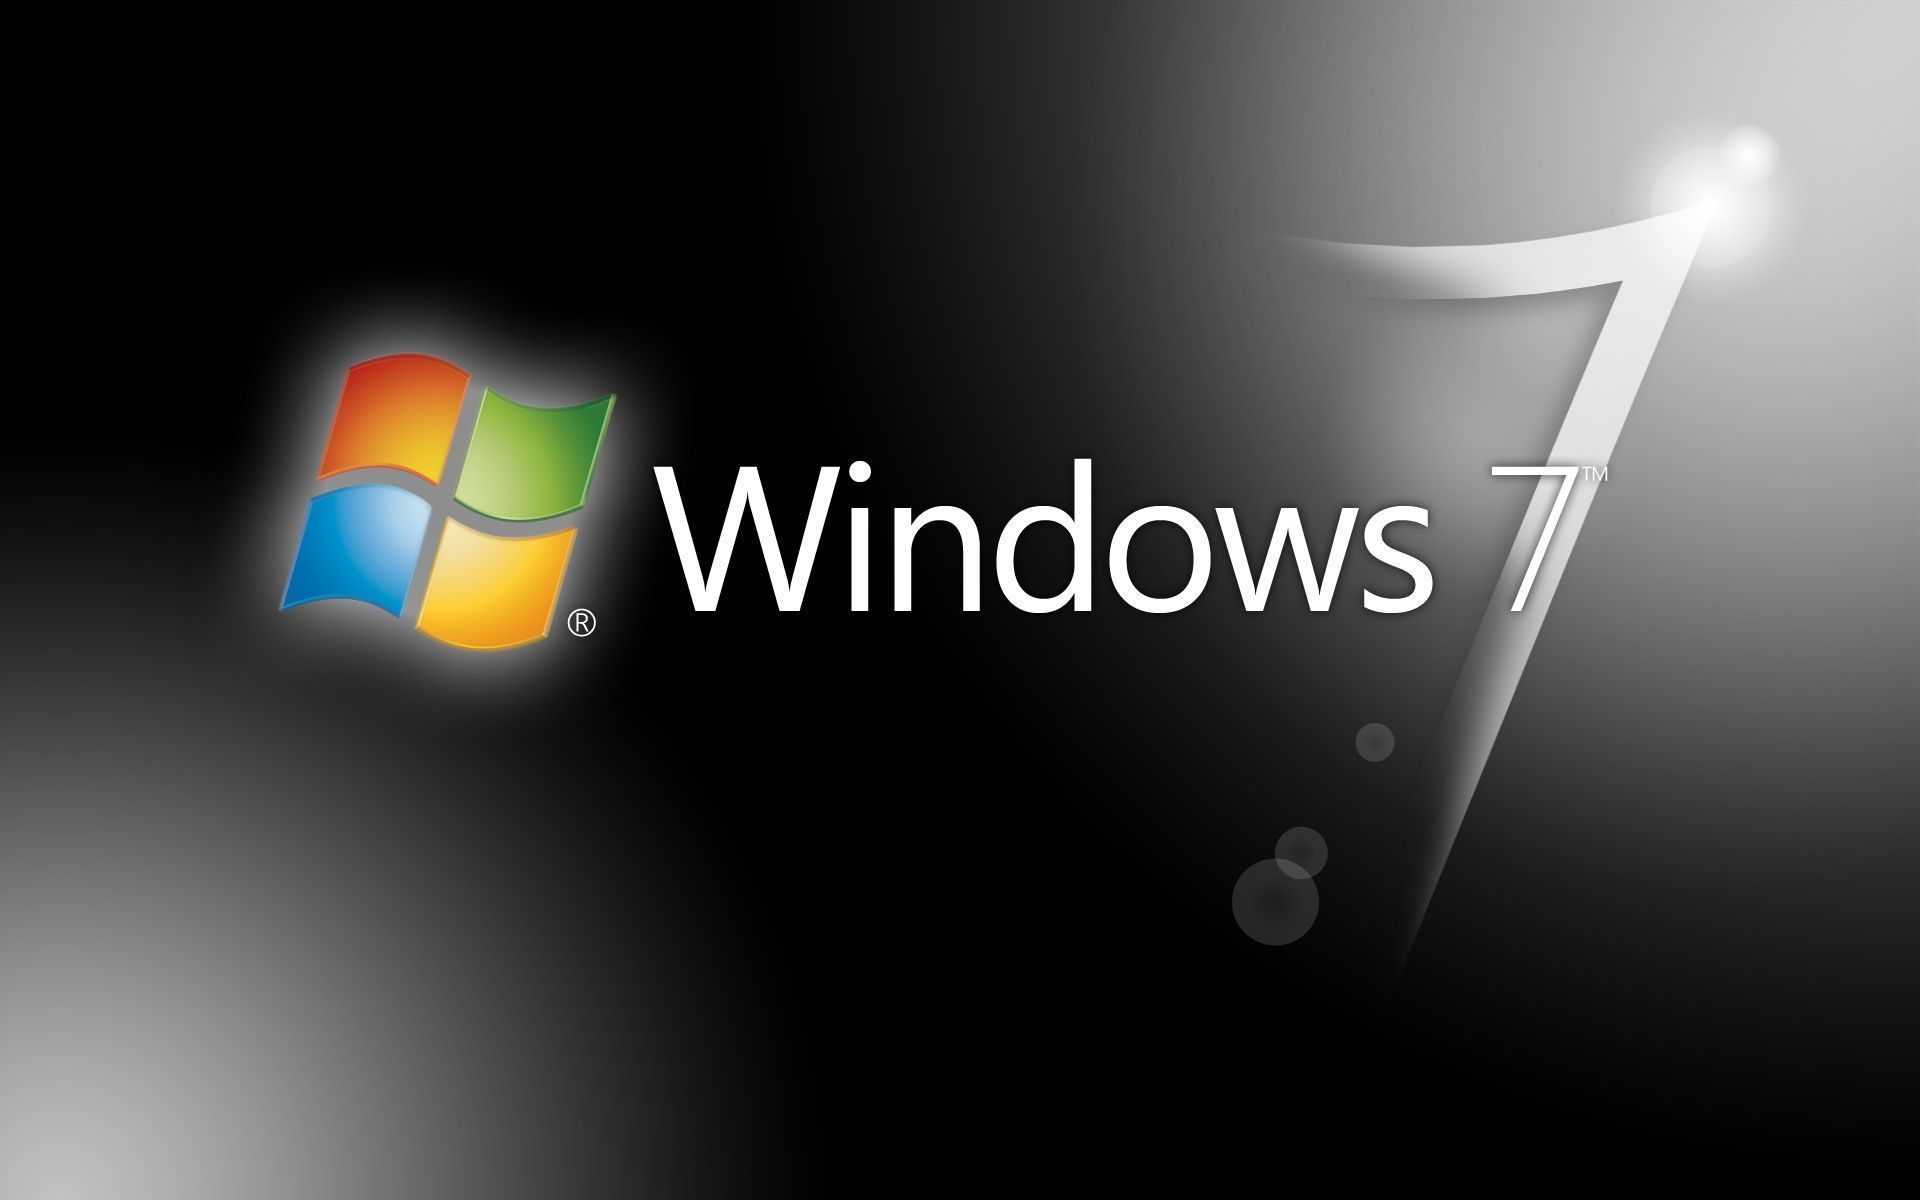 tags windows 7 81 pics windows 139 pics 1920x1200